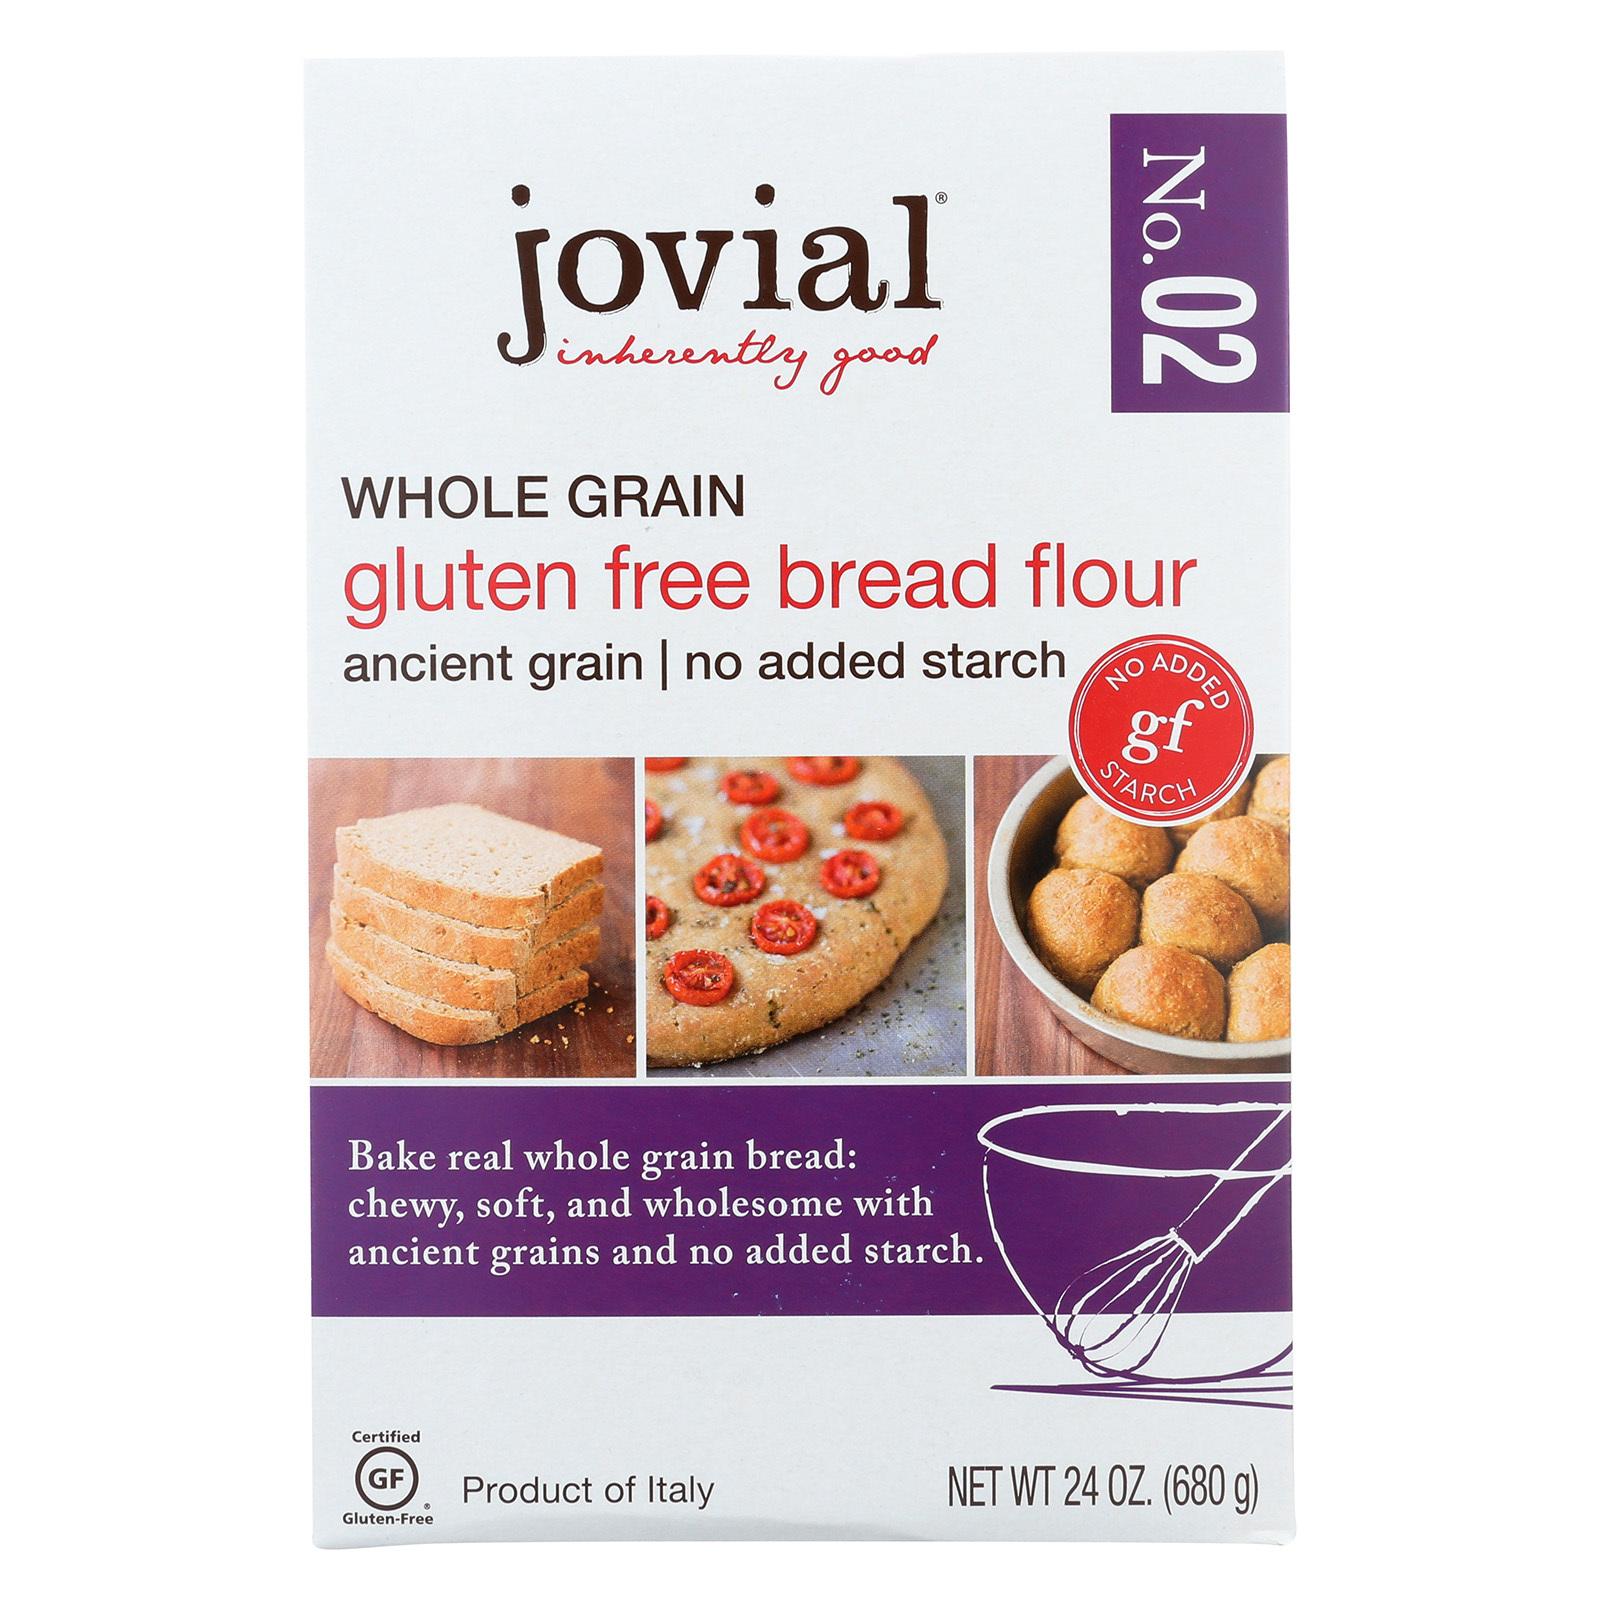 Jovial Gluten Free Bread Flour - Case of 6 - 24 oz.